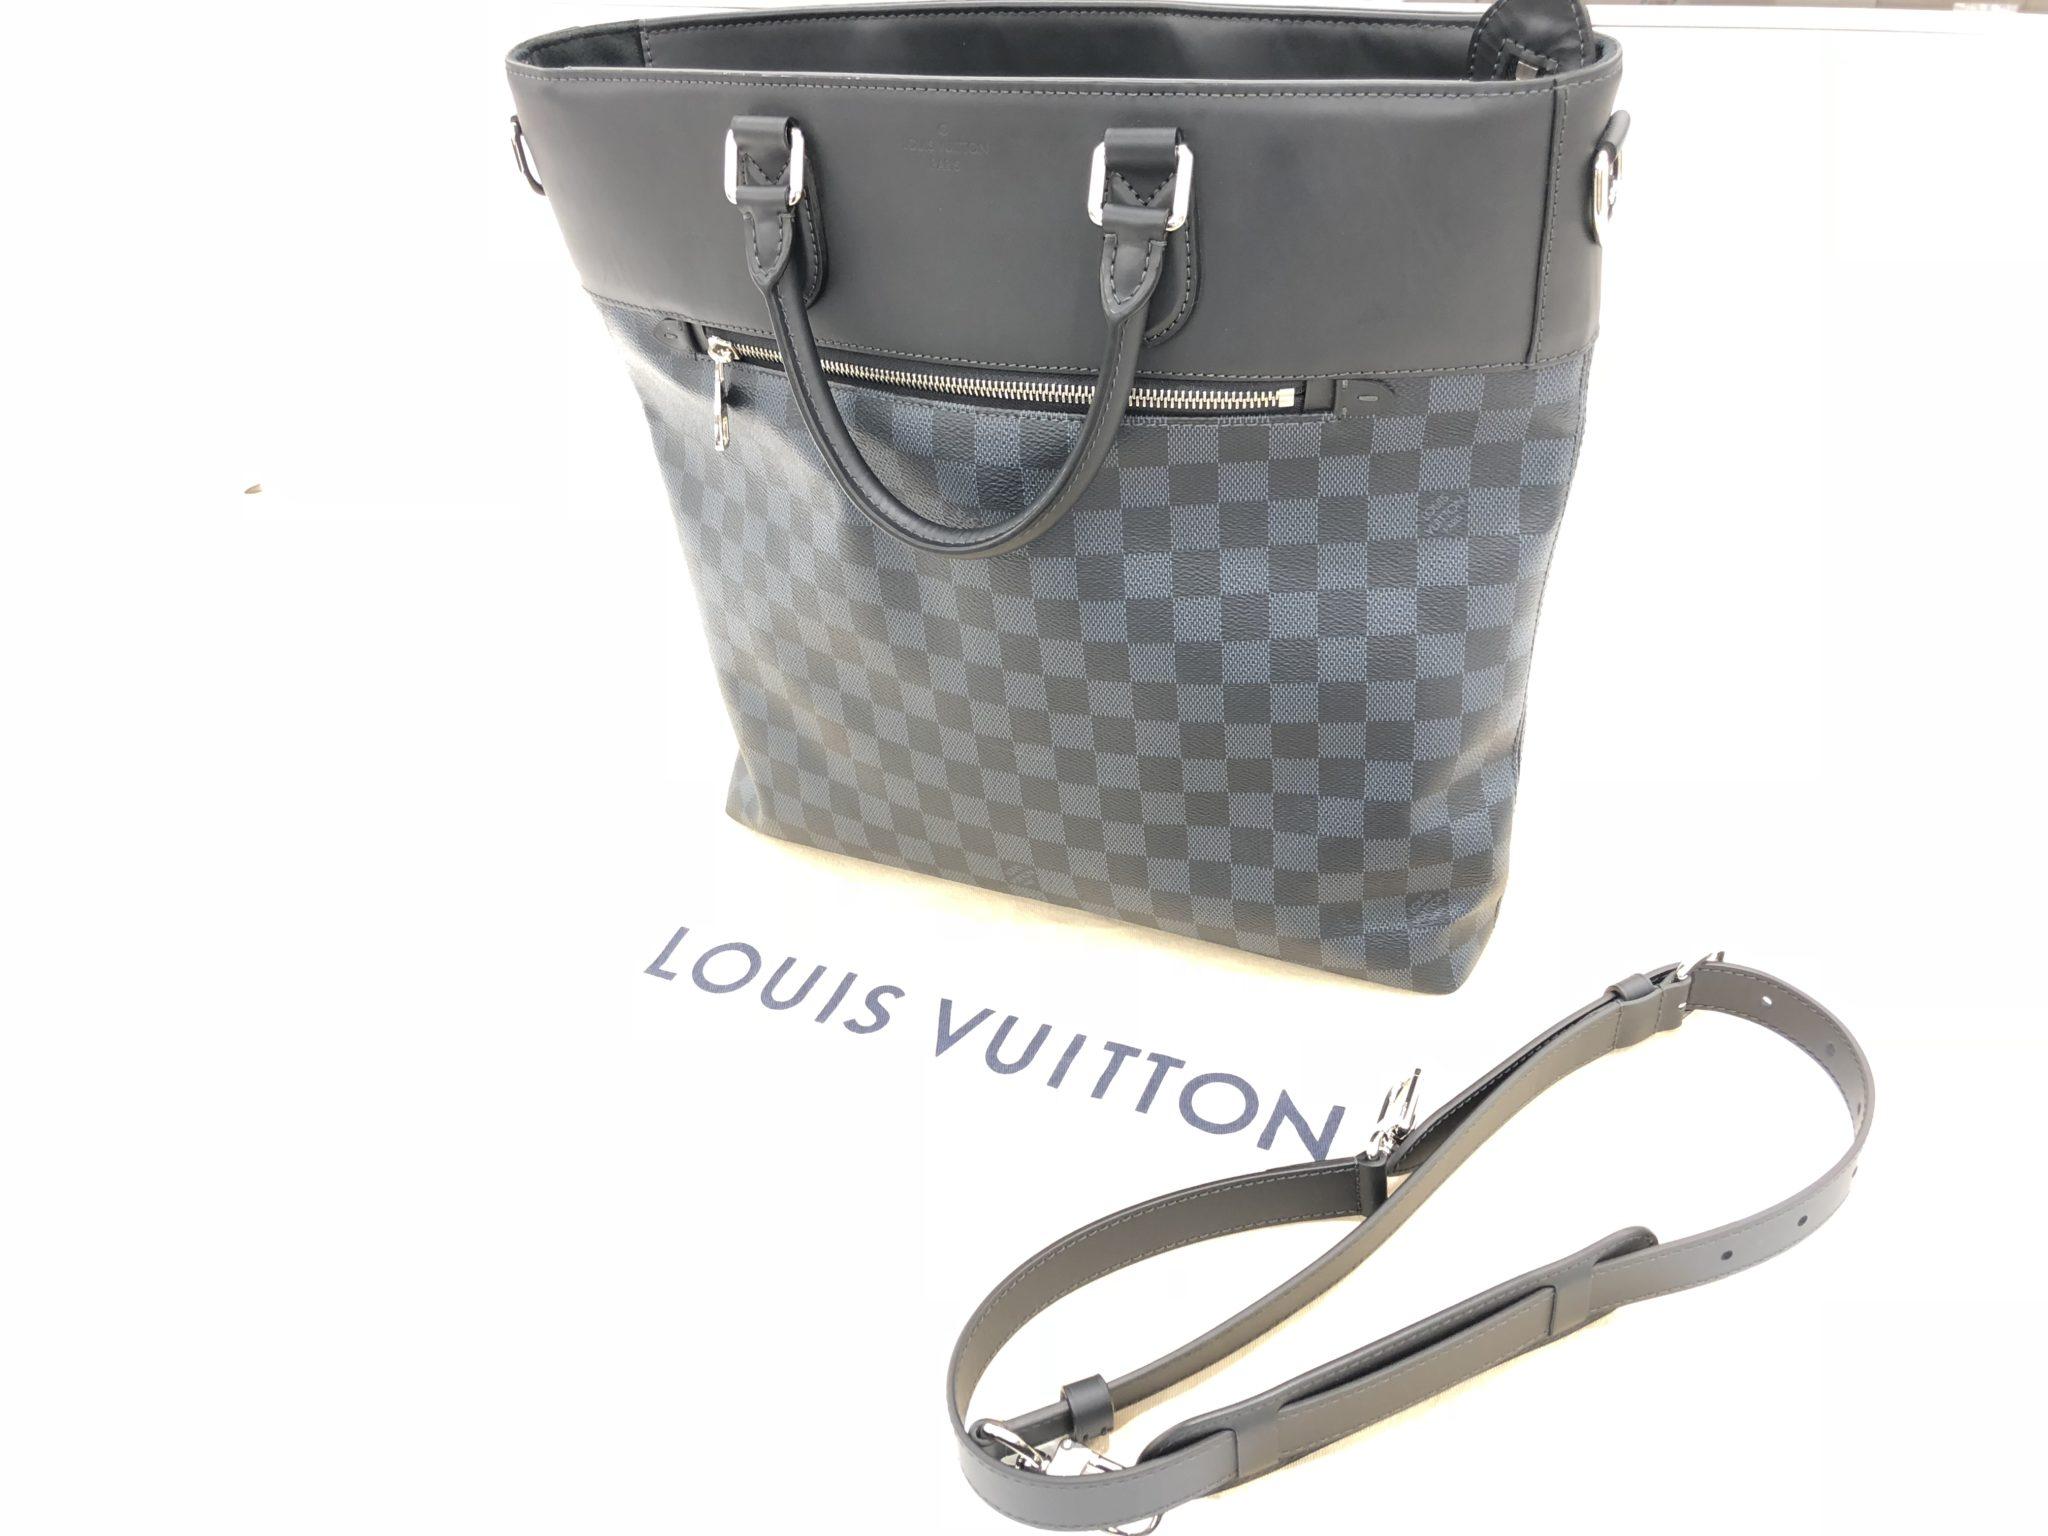 LOUIS VUITTON ニューポート・トート 入荷しました!!